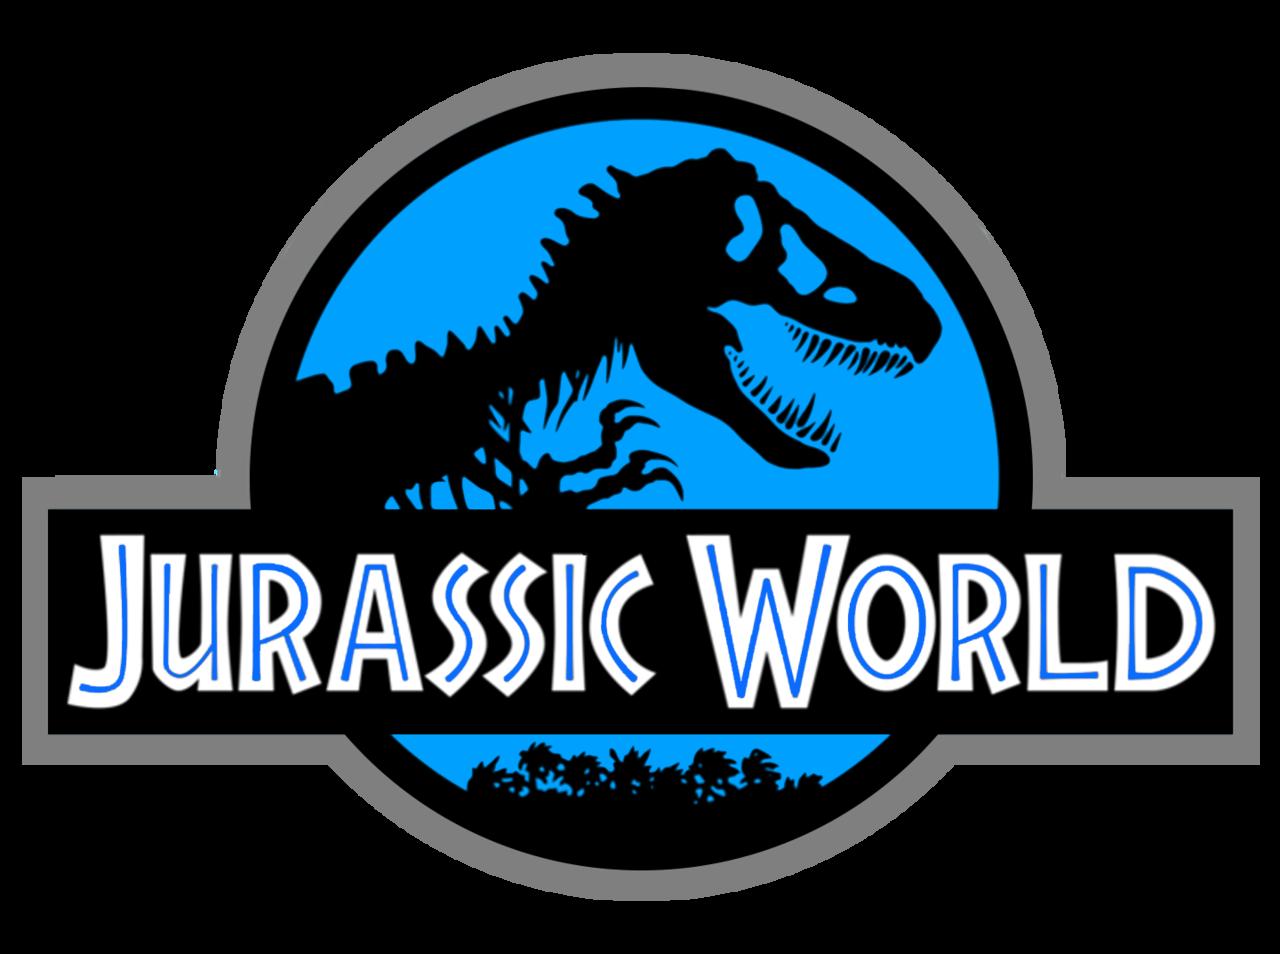 jurassic world logo vector.